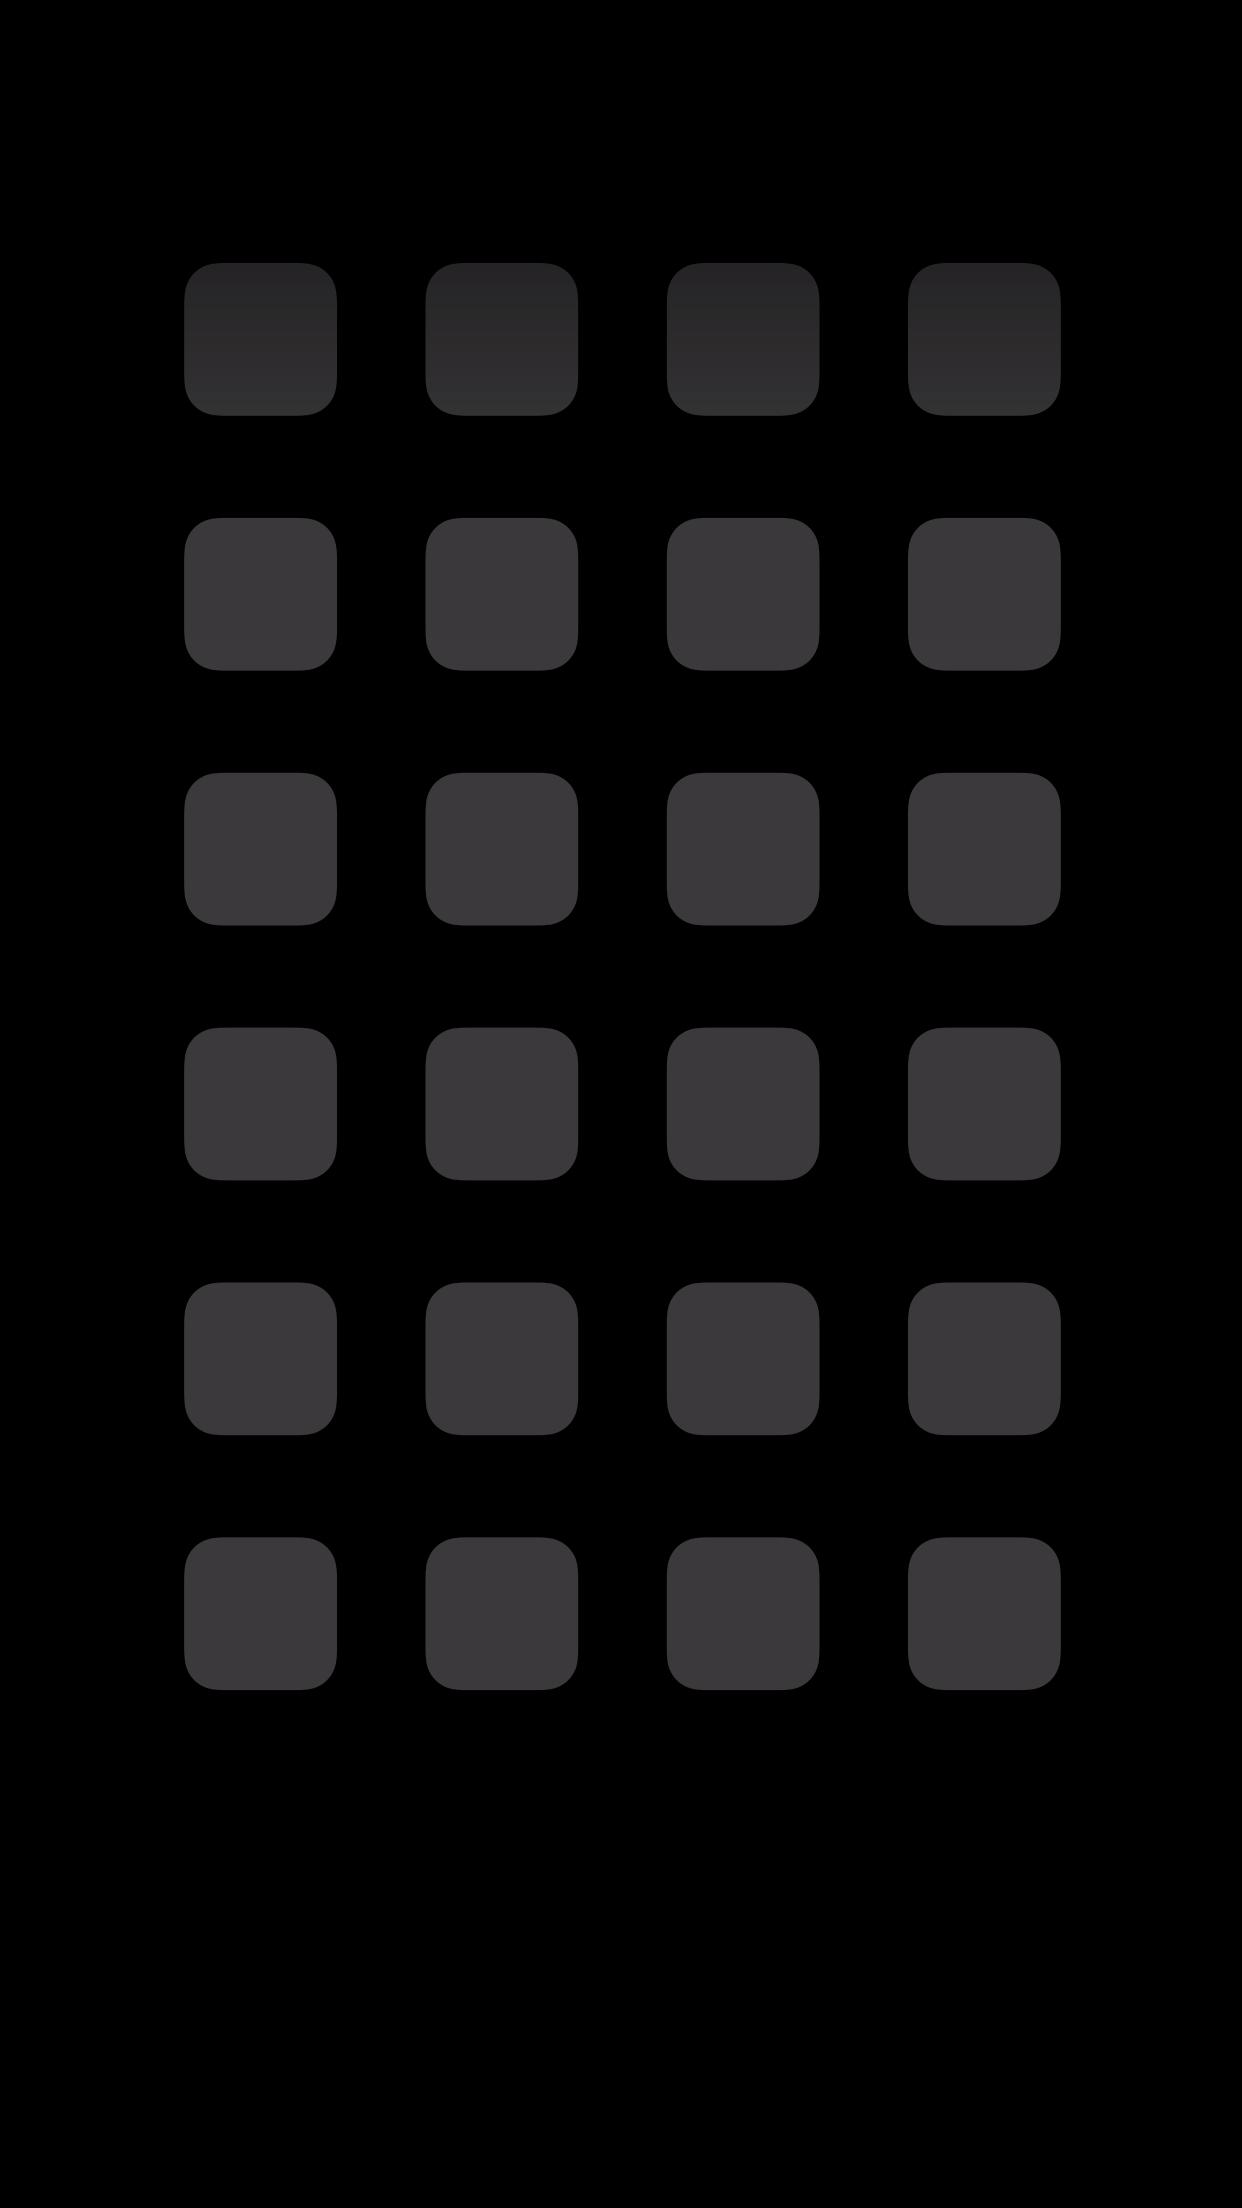 iPhone6 Plus 動く棚の壁紙 ブラック&ブラック